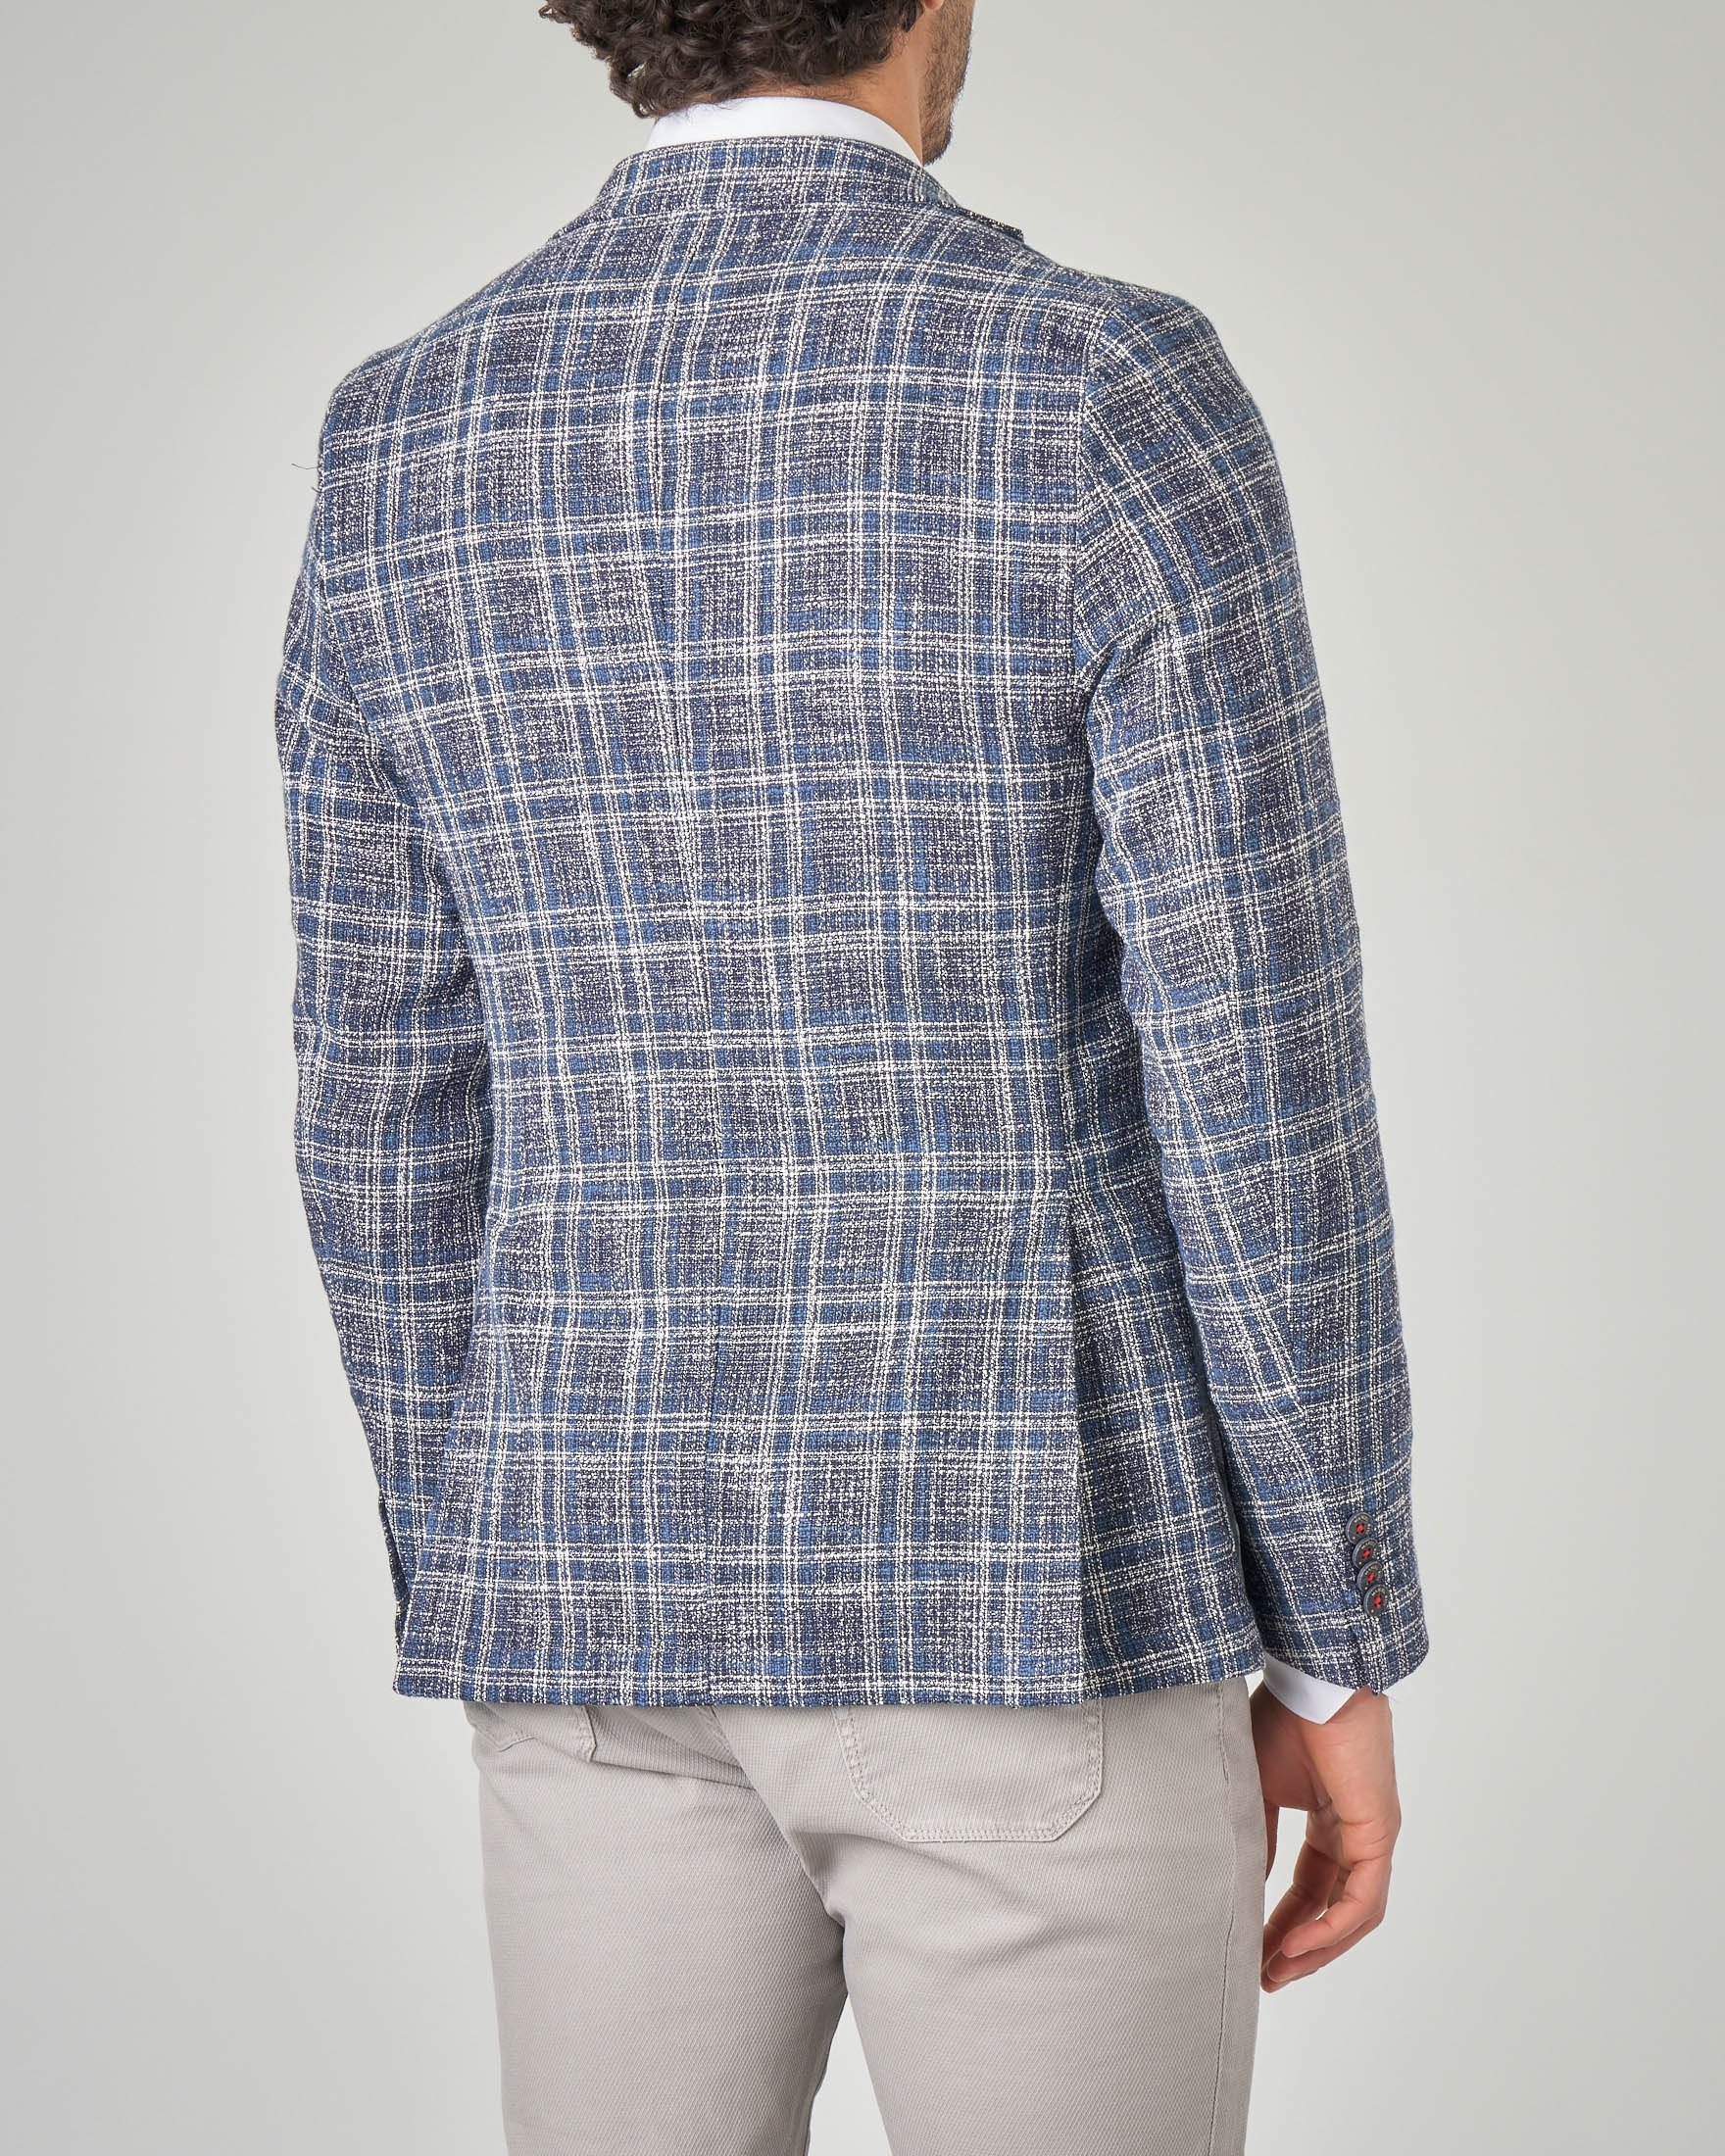 new concept ceadb 4ed39 Giacca blu e bianca a quadri | Pellizzari E-commerce